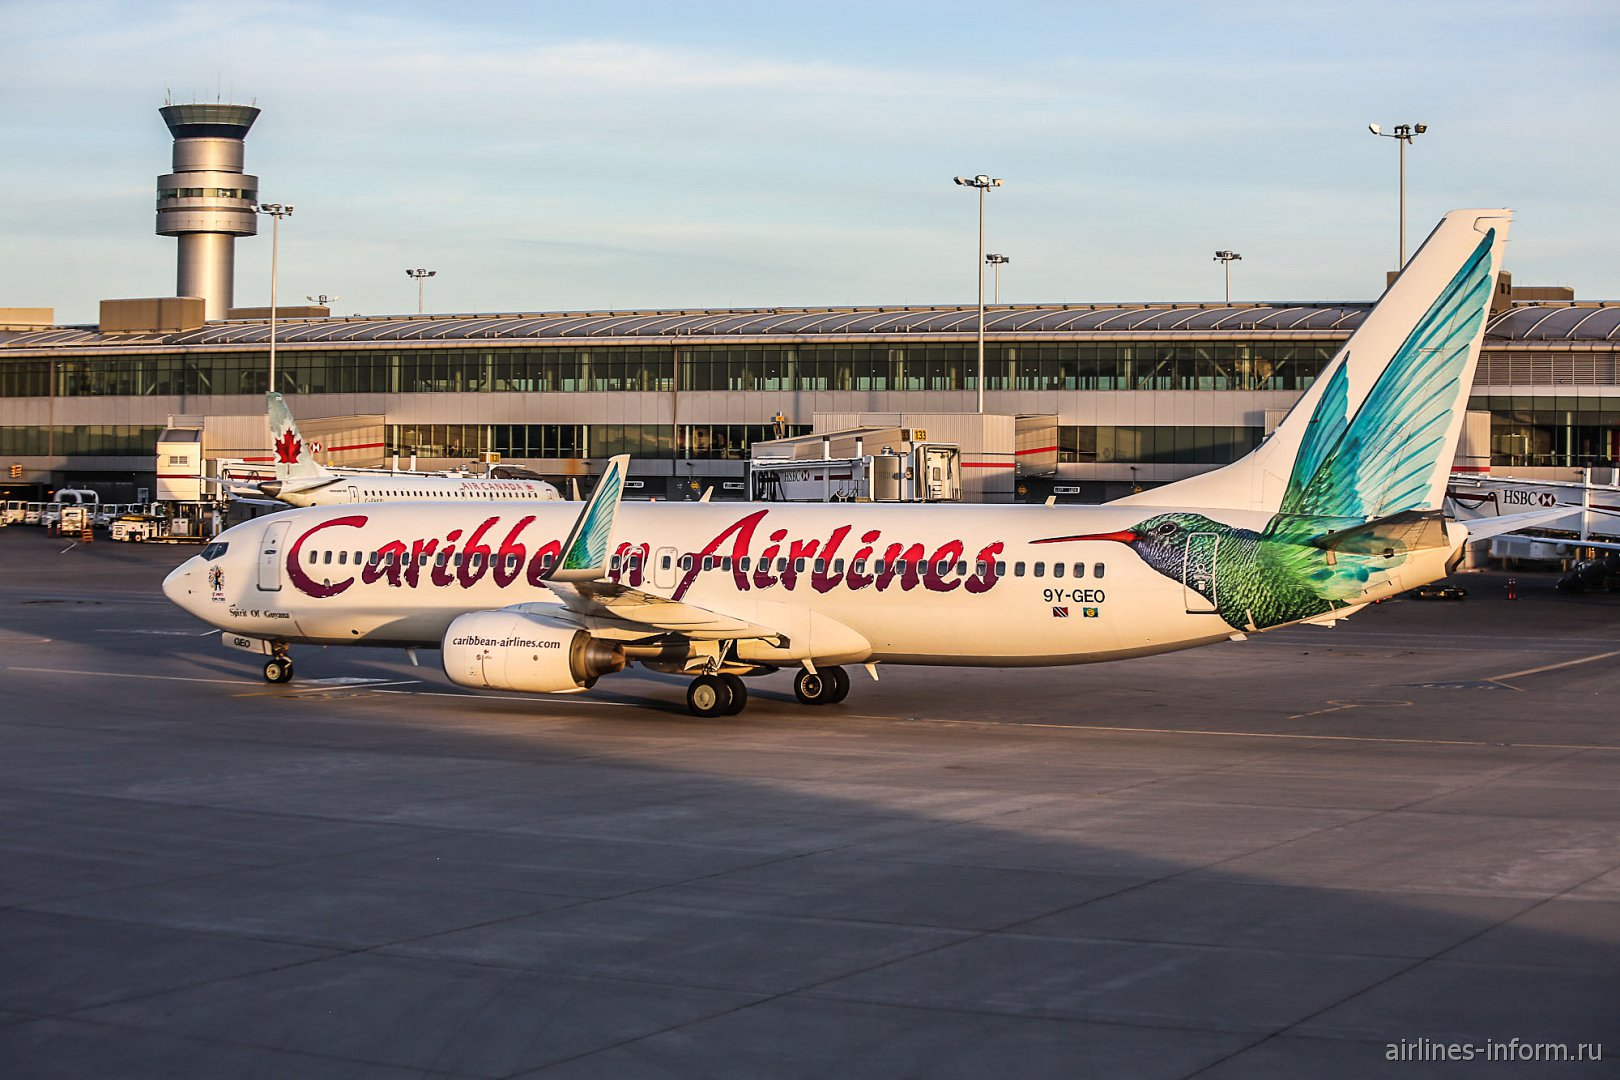 Боинг-737-800 9Y-GEO авиакомпании Caribbean Airlines в аэропорту Торонто Пирсон